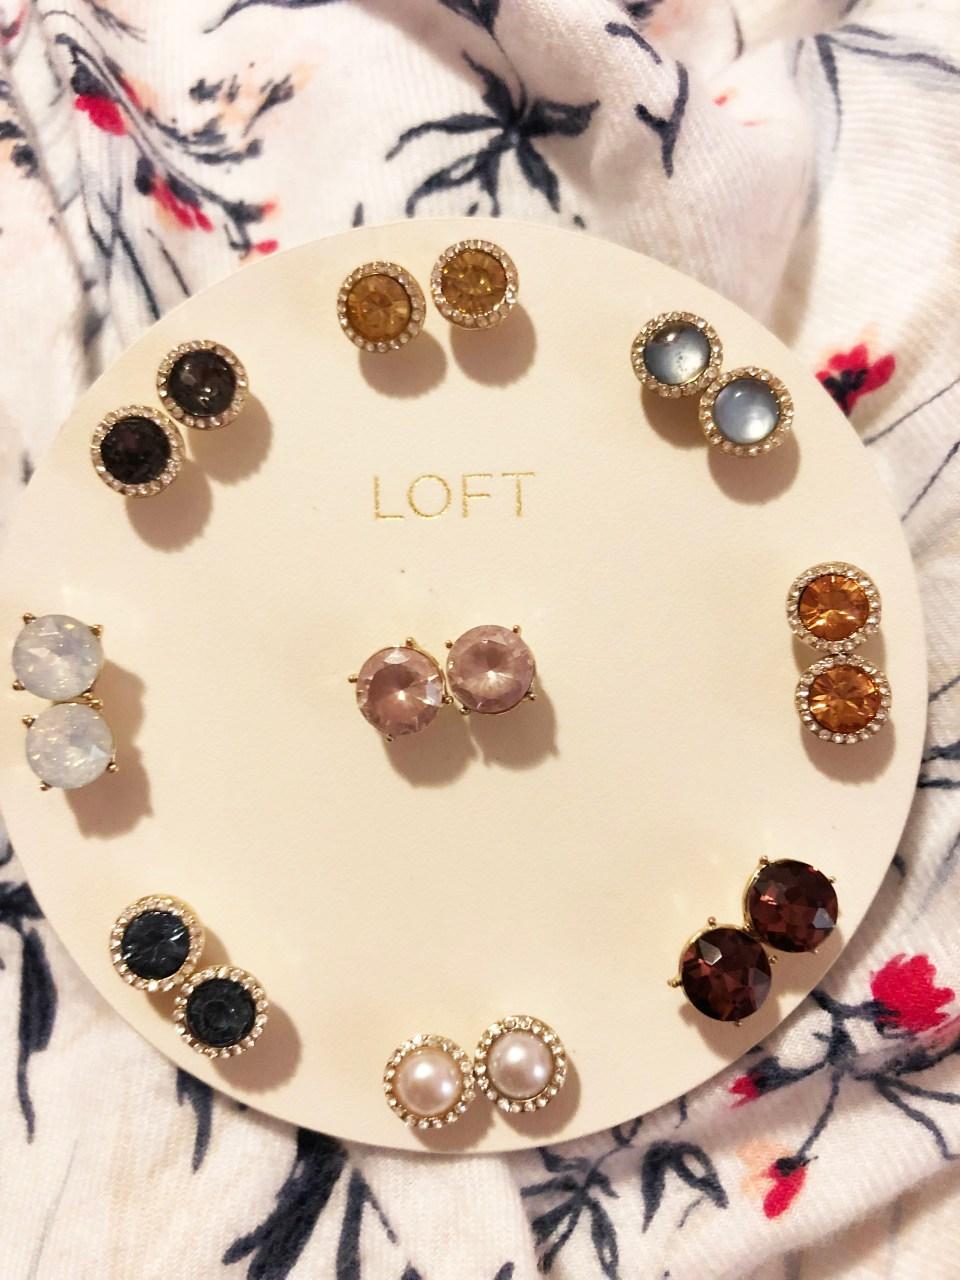 LOFT stud earring set